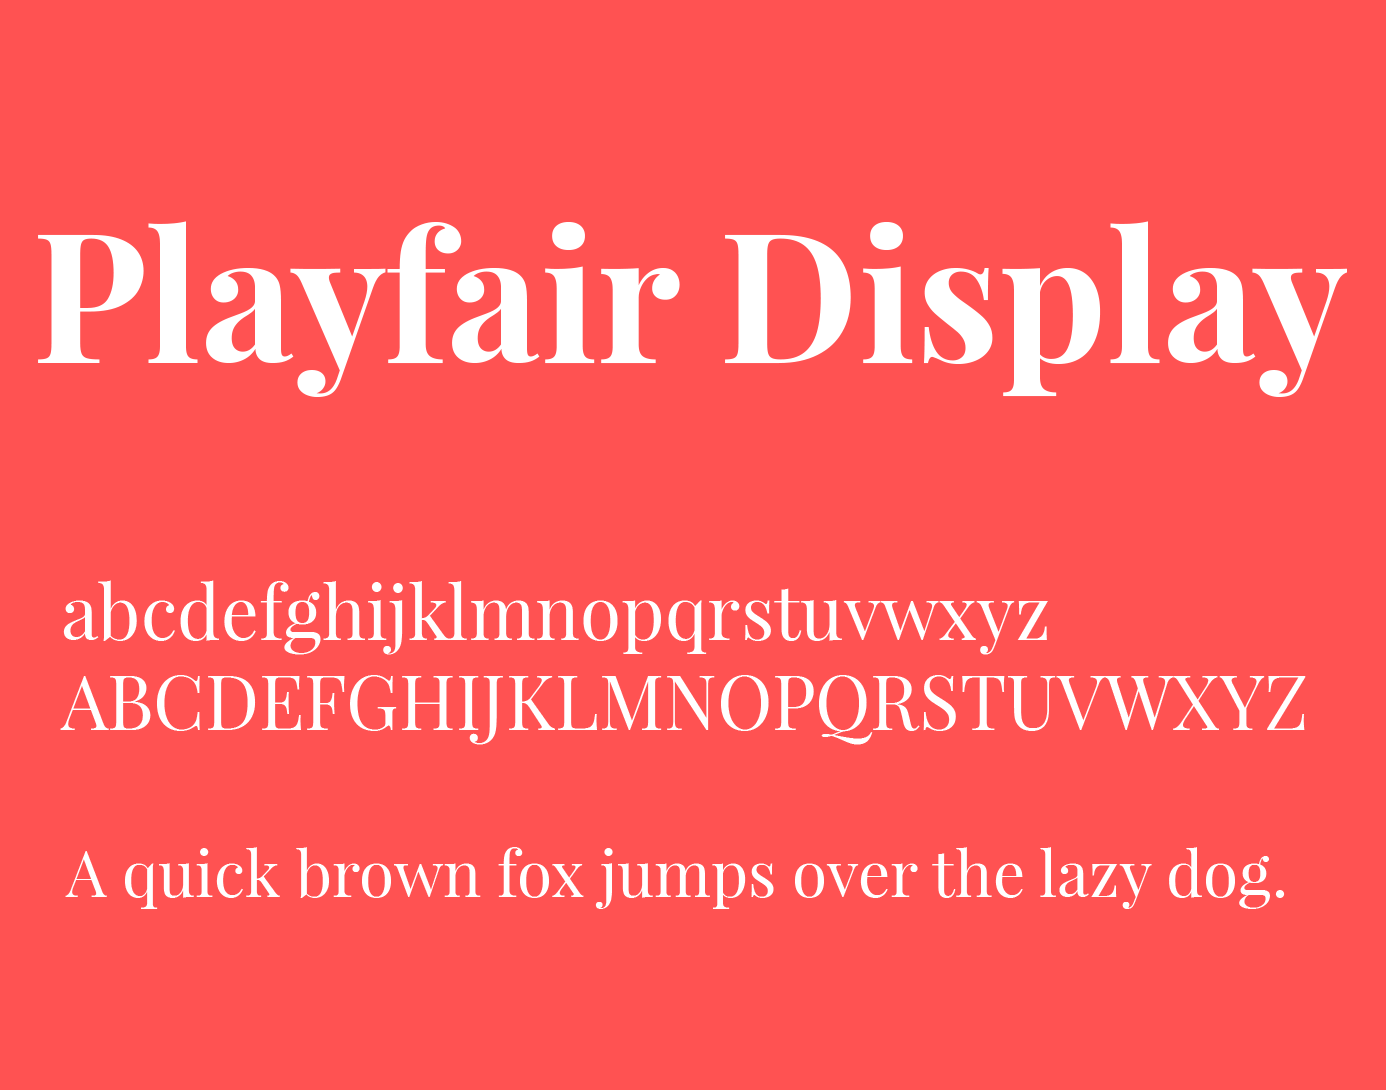 Playfair Display Font Family Free Download | Graphic Design | Google